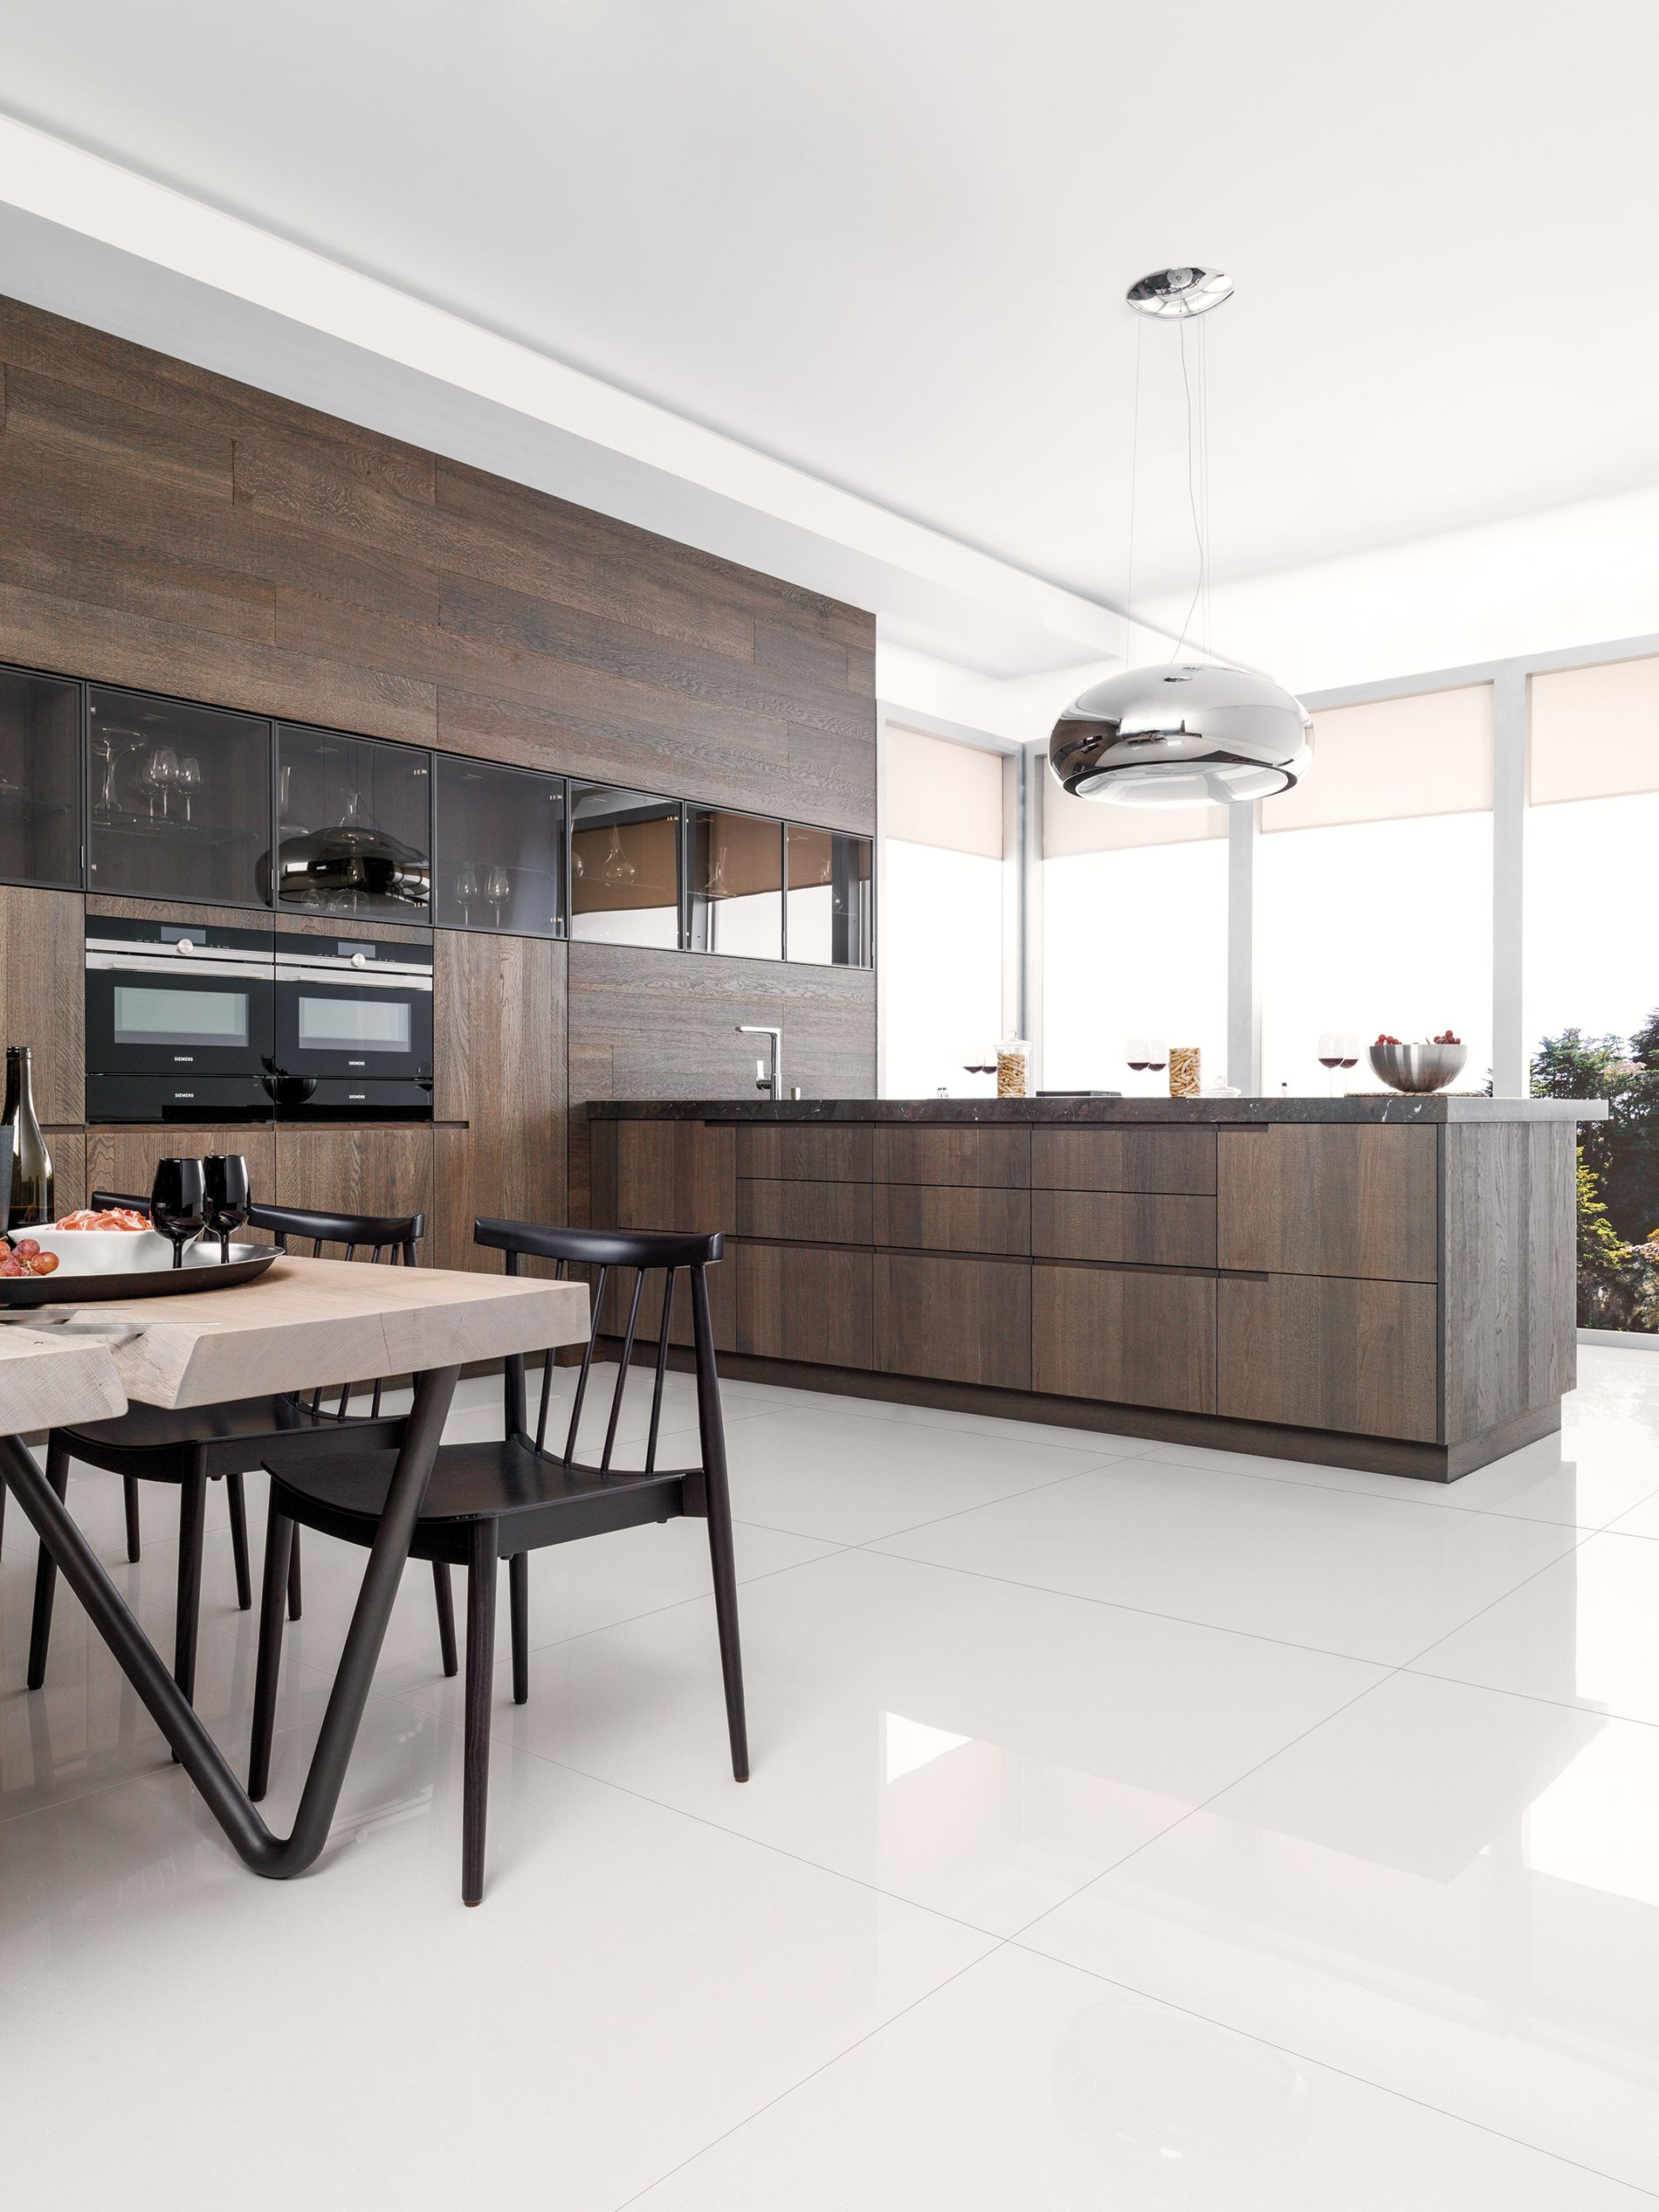 Mooie Indeling Restaurant Design Pinterest Kitchens  # Muebles Deurope